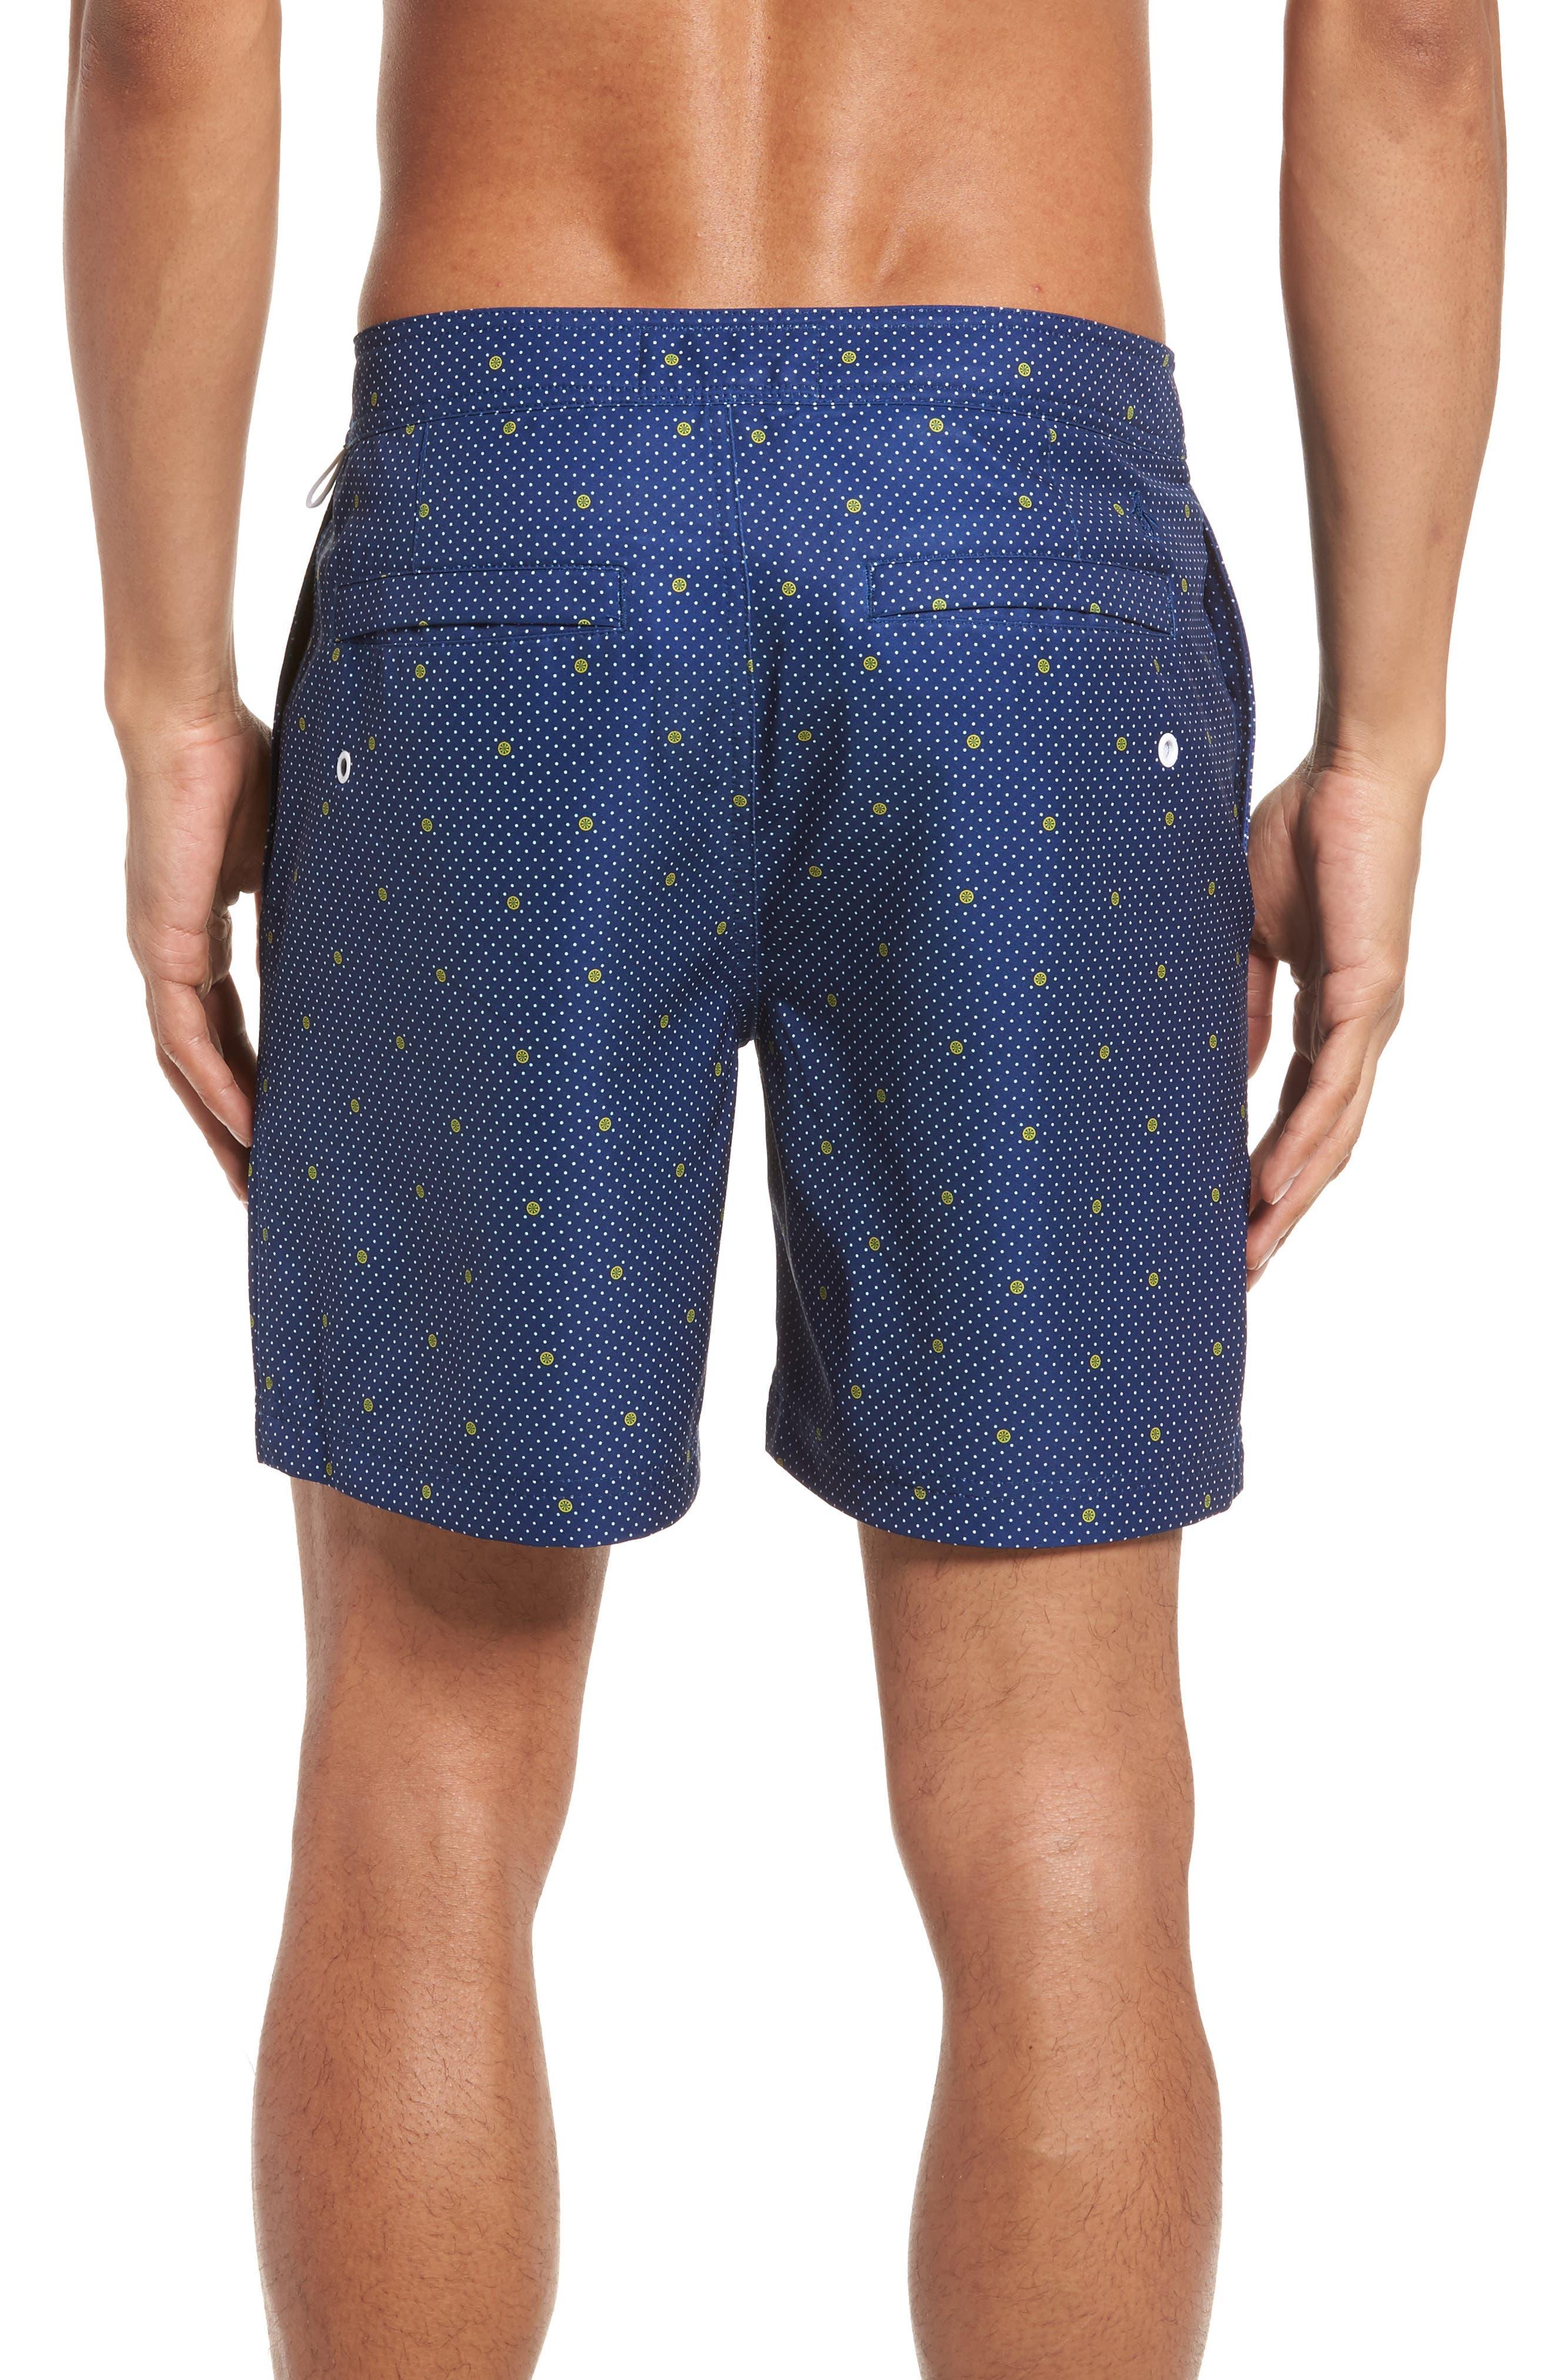 Alternate Image 2  - Original Penguin Polka Dot Lemon Volley Board Shorts